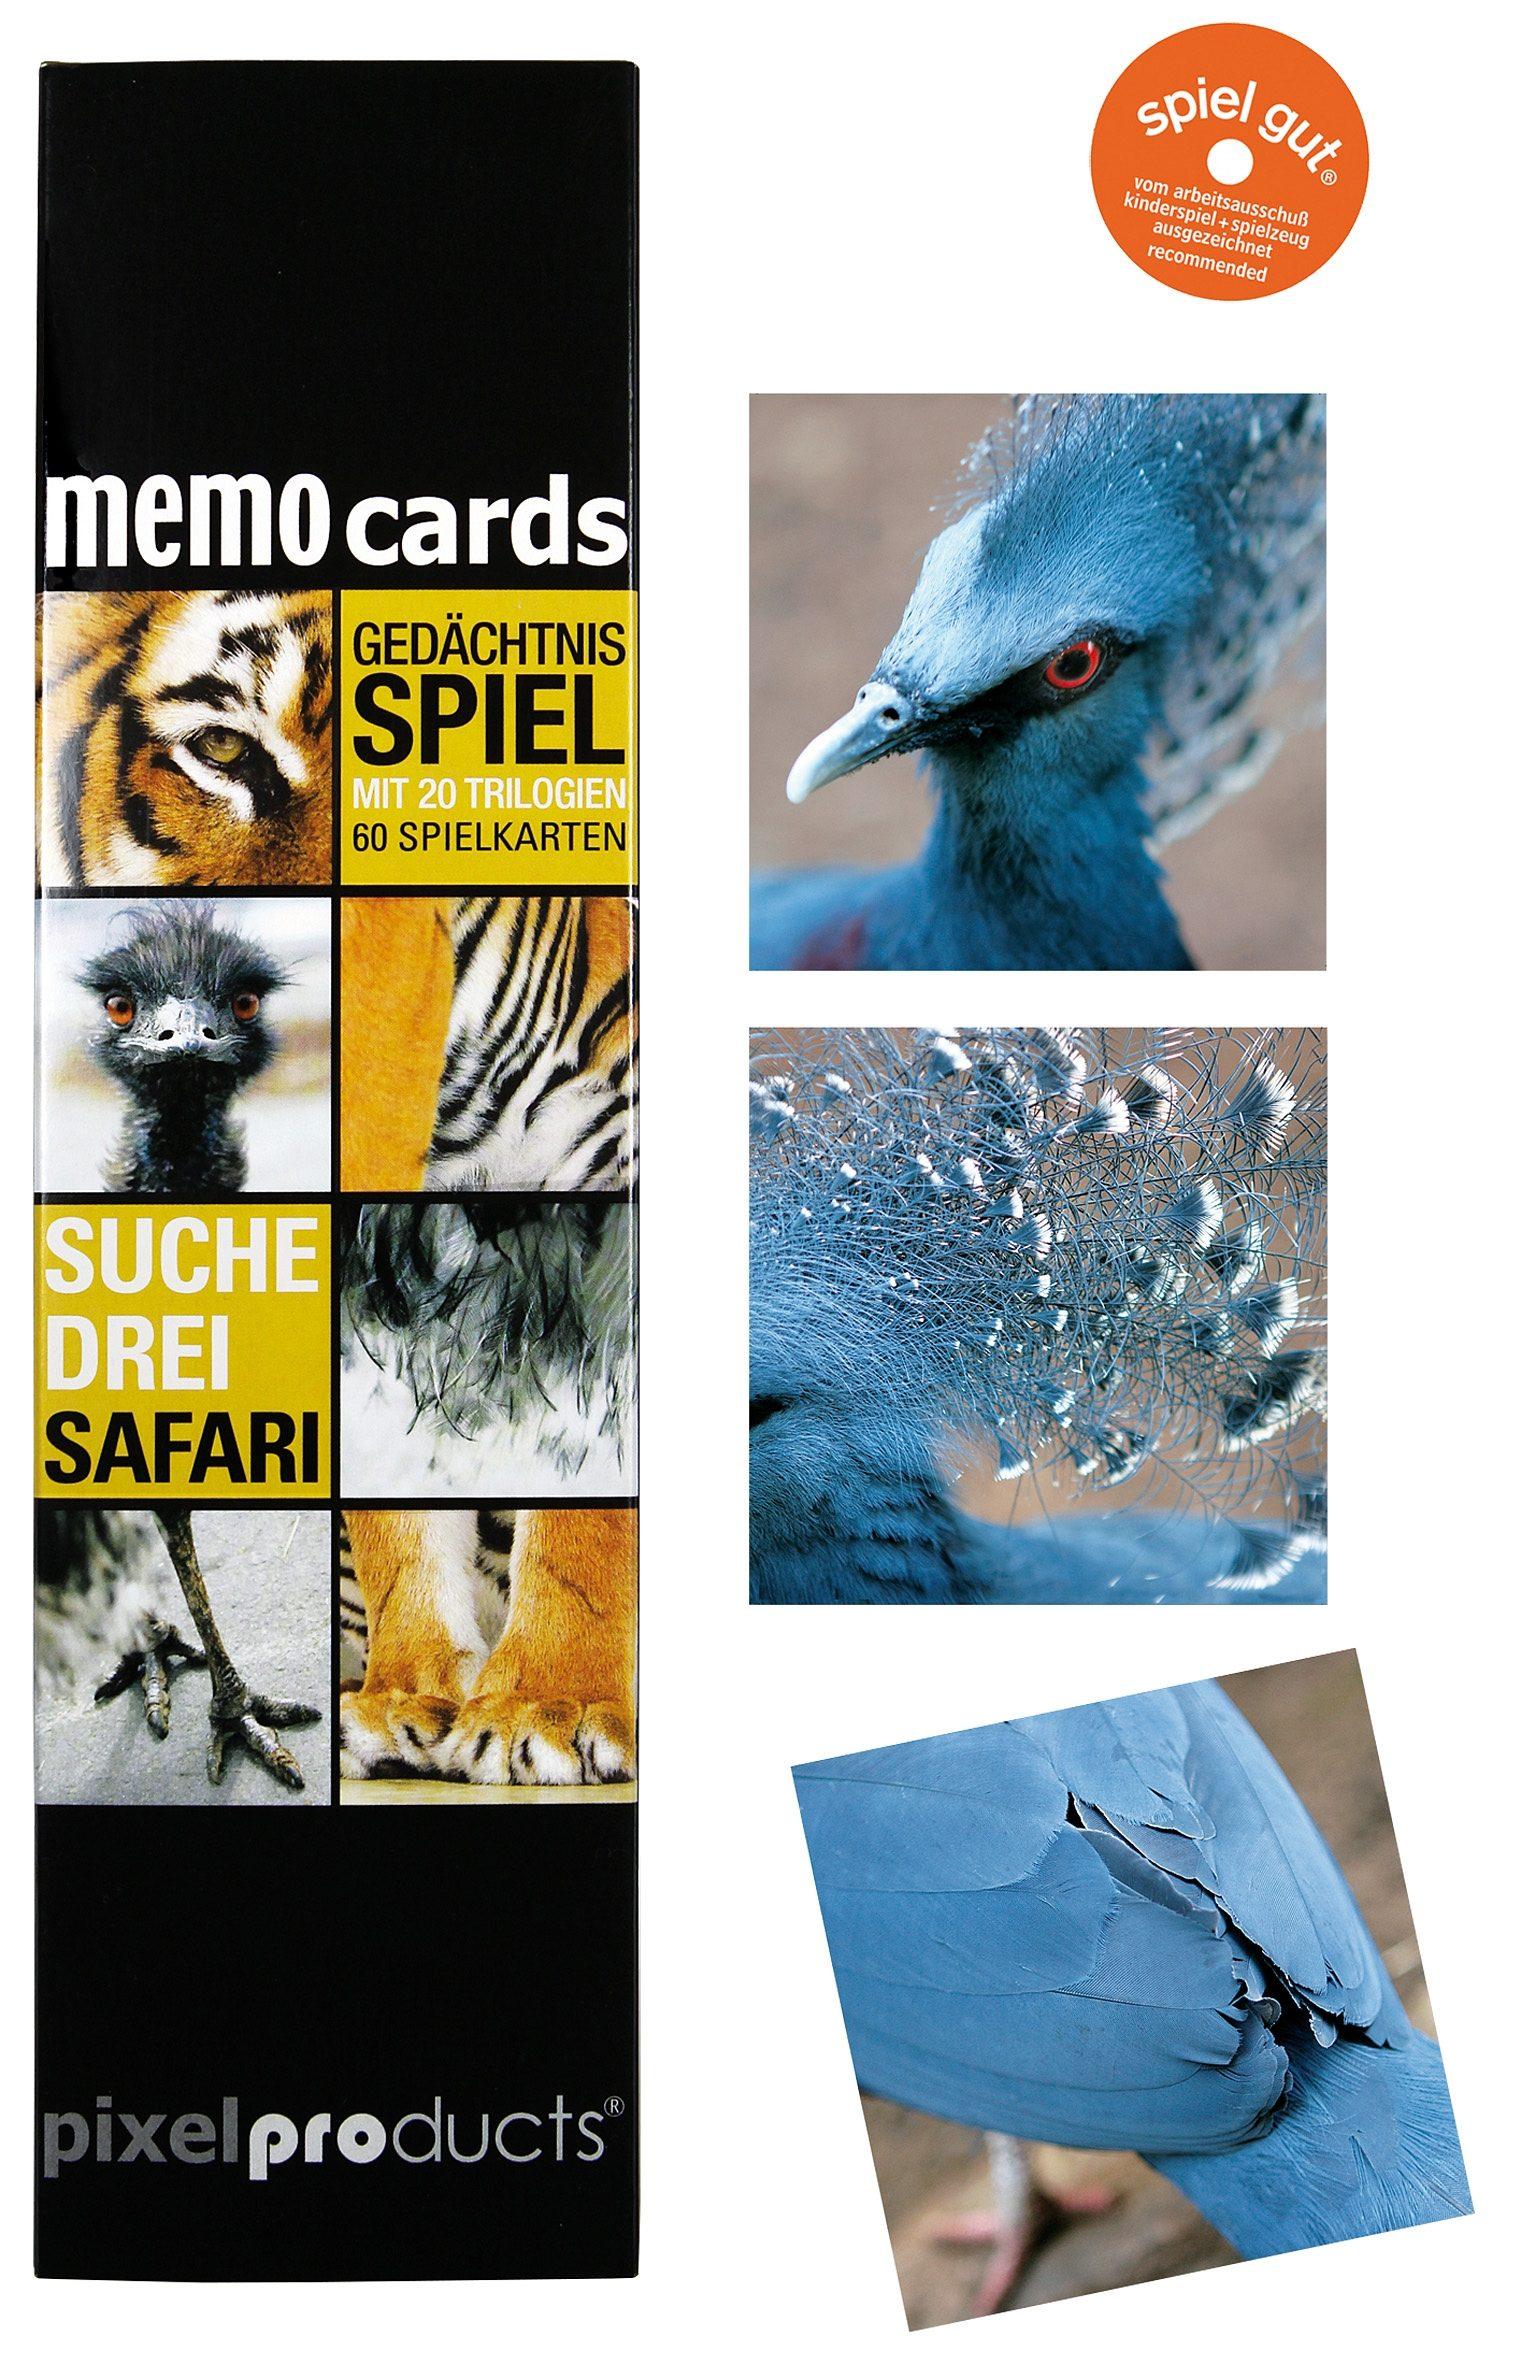 Memospiel, »Pixelproducts, Suche Drei Safari«